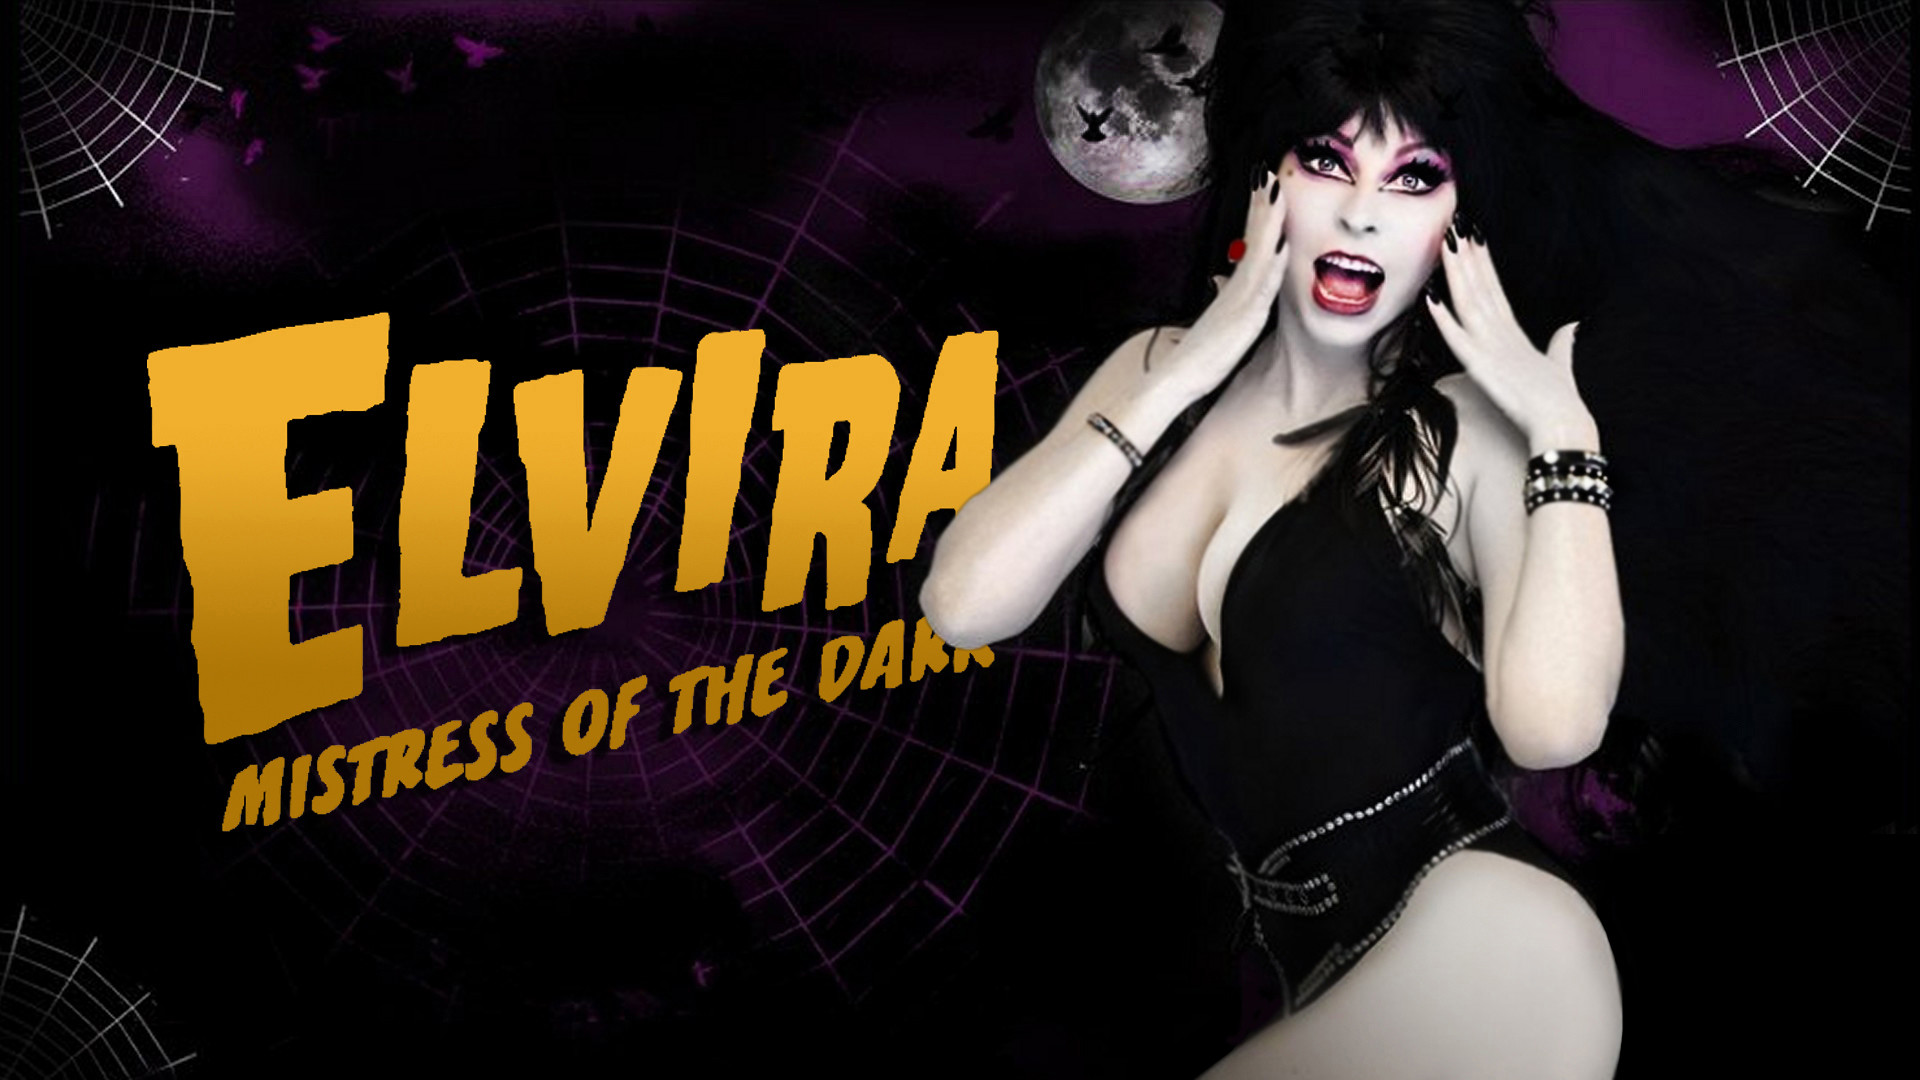 Elvira Mistress Of The Dark Wallpaper